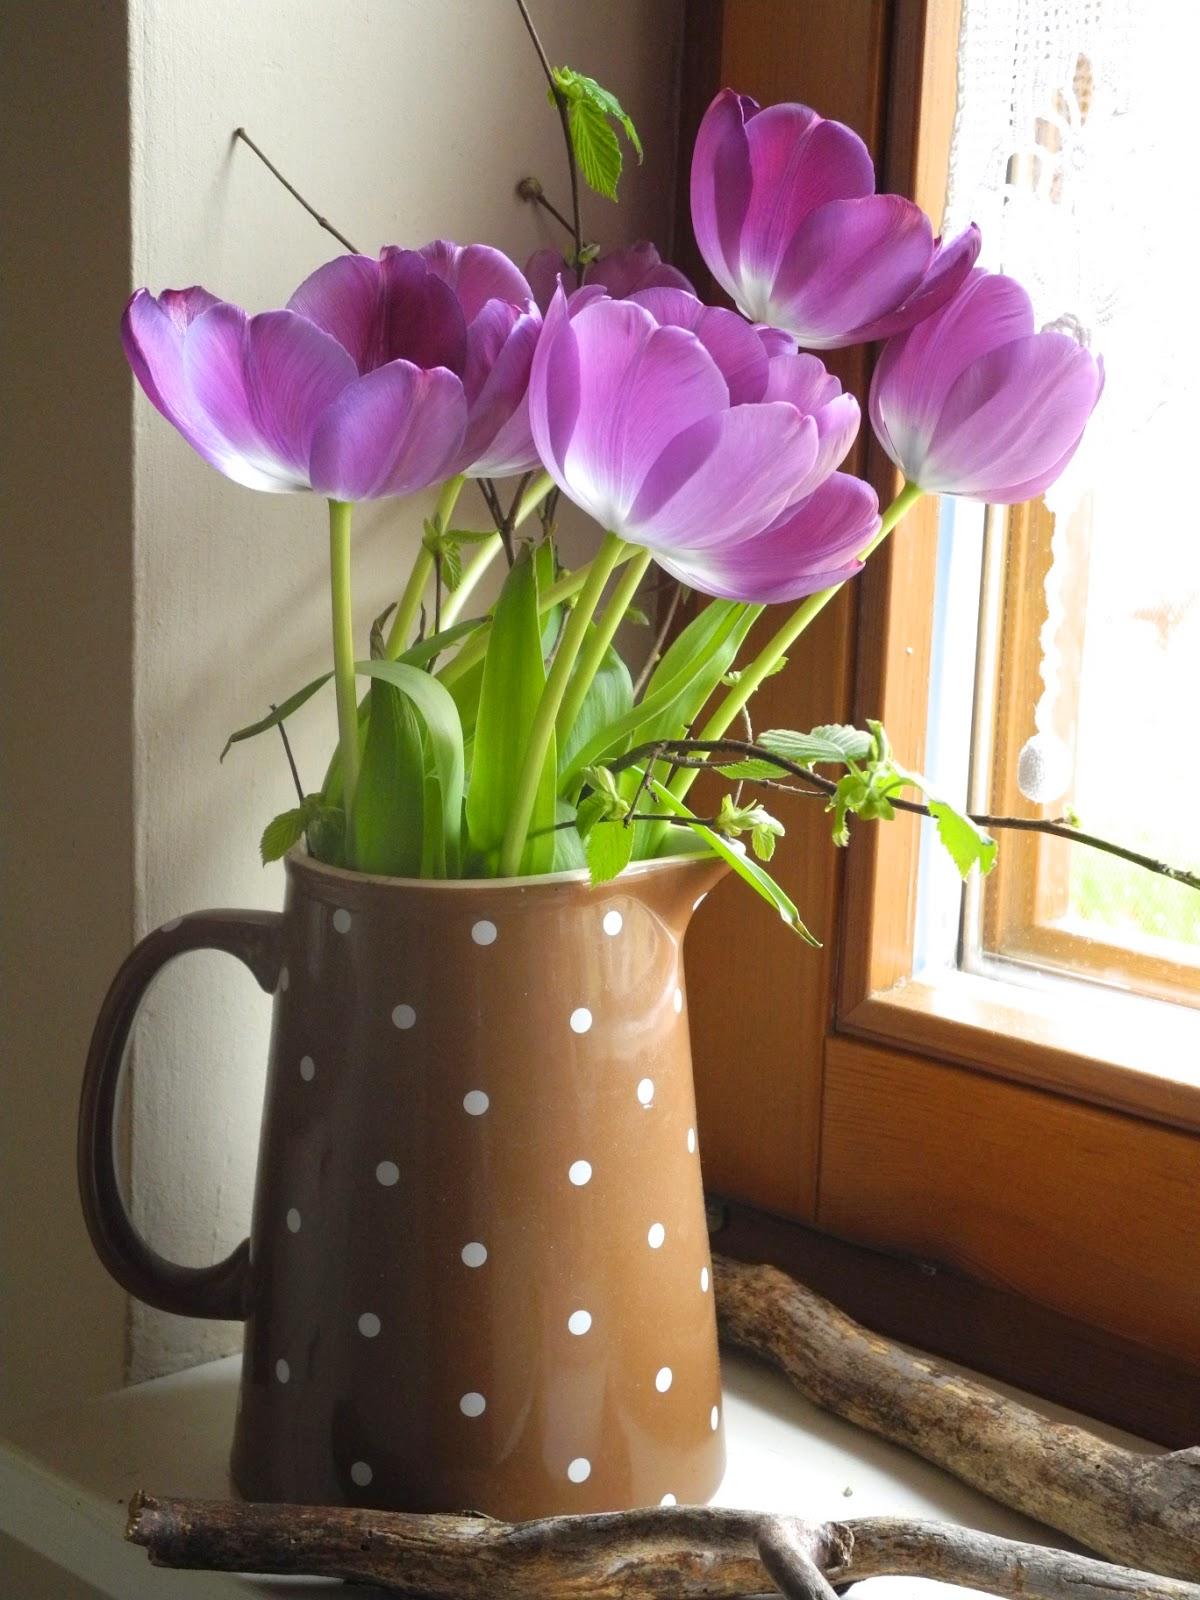 schmiedegarten tulpen in der vase. Black Bedroom Furniture Sets. Home Design Ideas